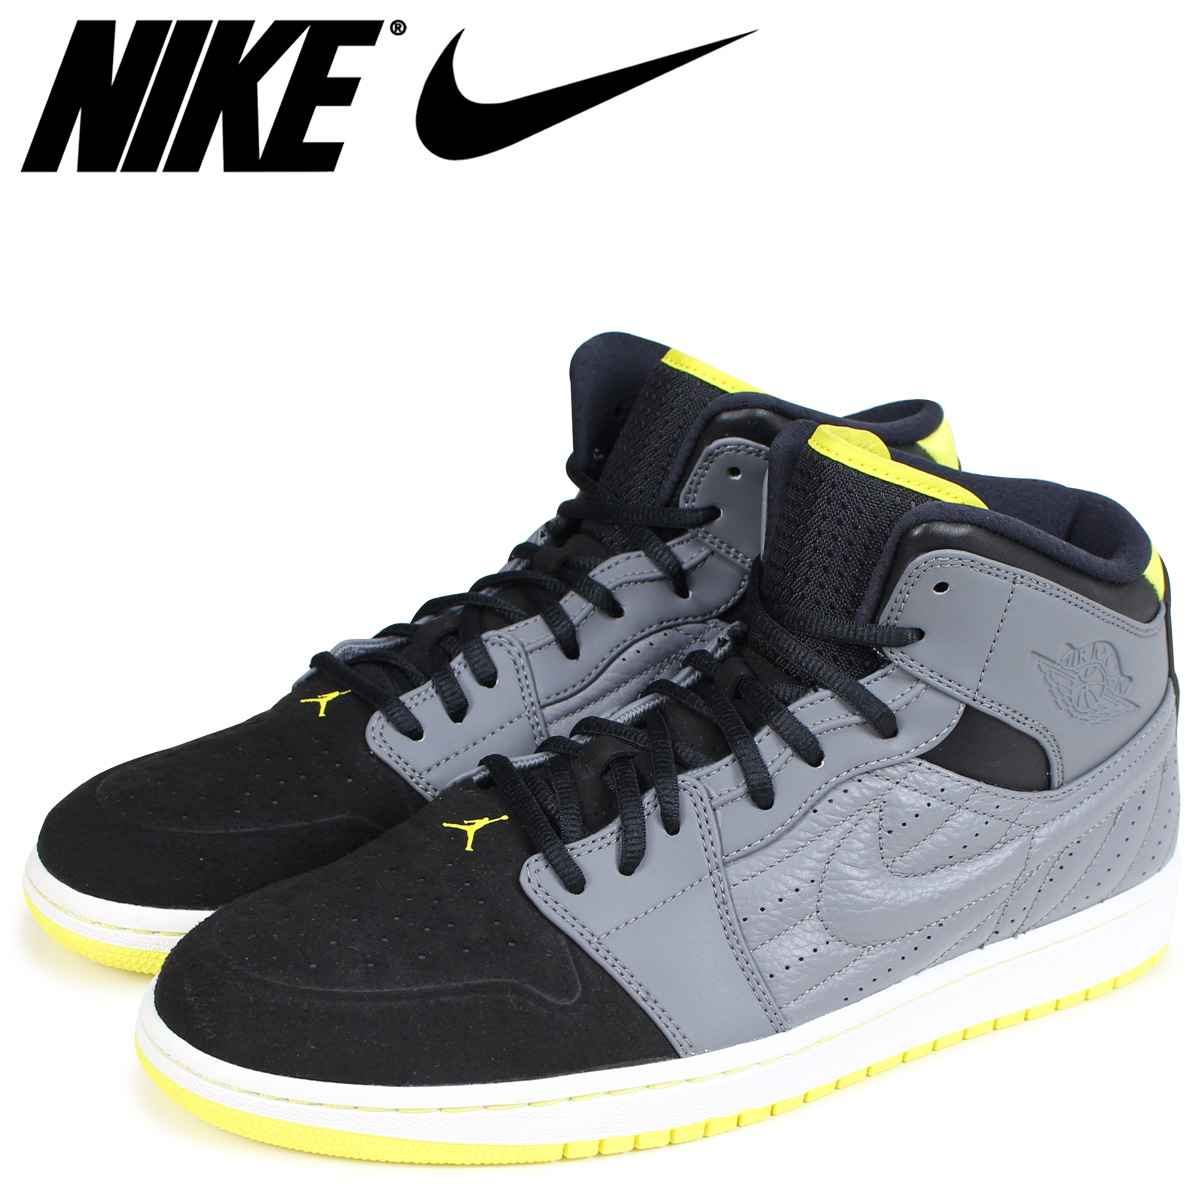 594d503abf64 NIKE Nike Air Jordan 1 nostalgic sneakers men AIR JORDAN 1 RETRO 99 AJ14  654